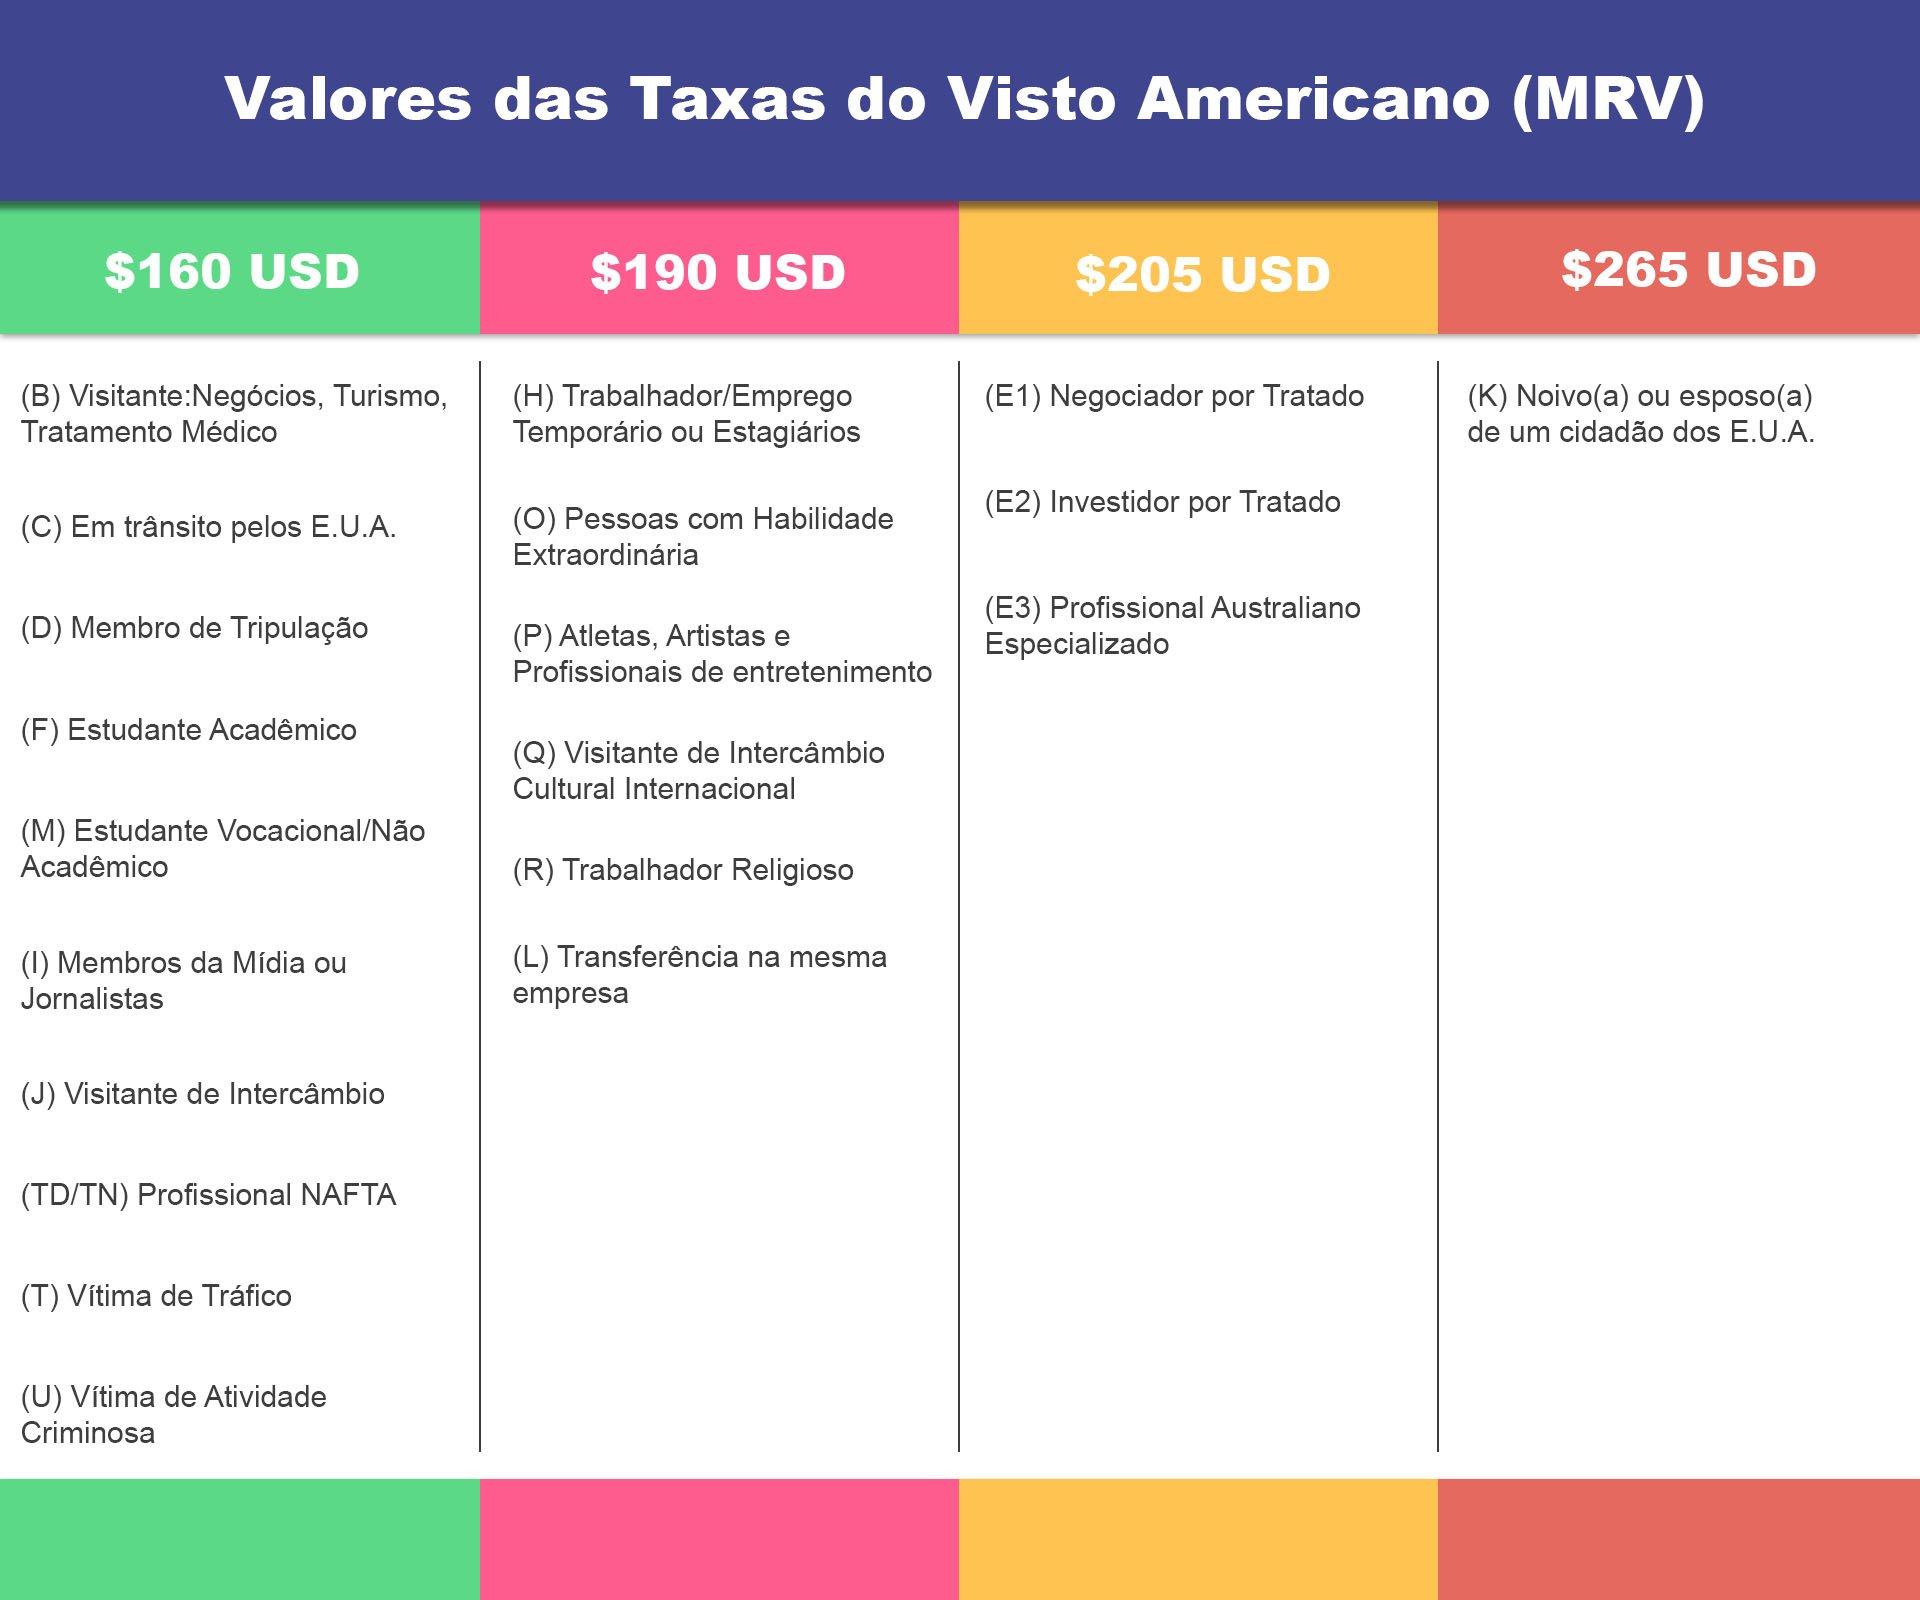 tabela de Valores das Taxas do Visto Americano (MRV)